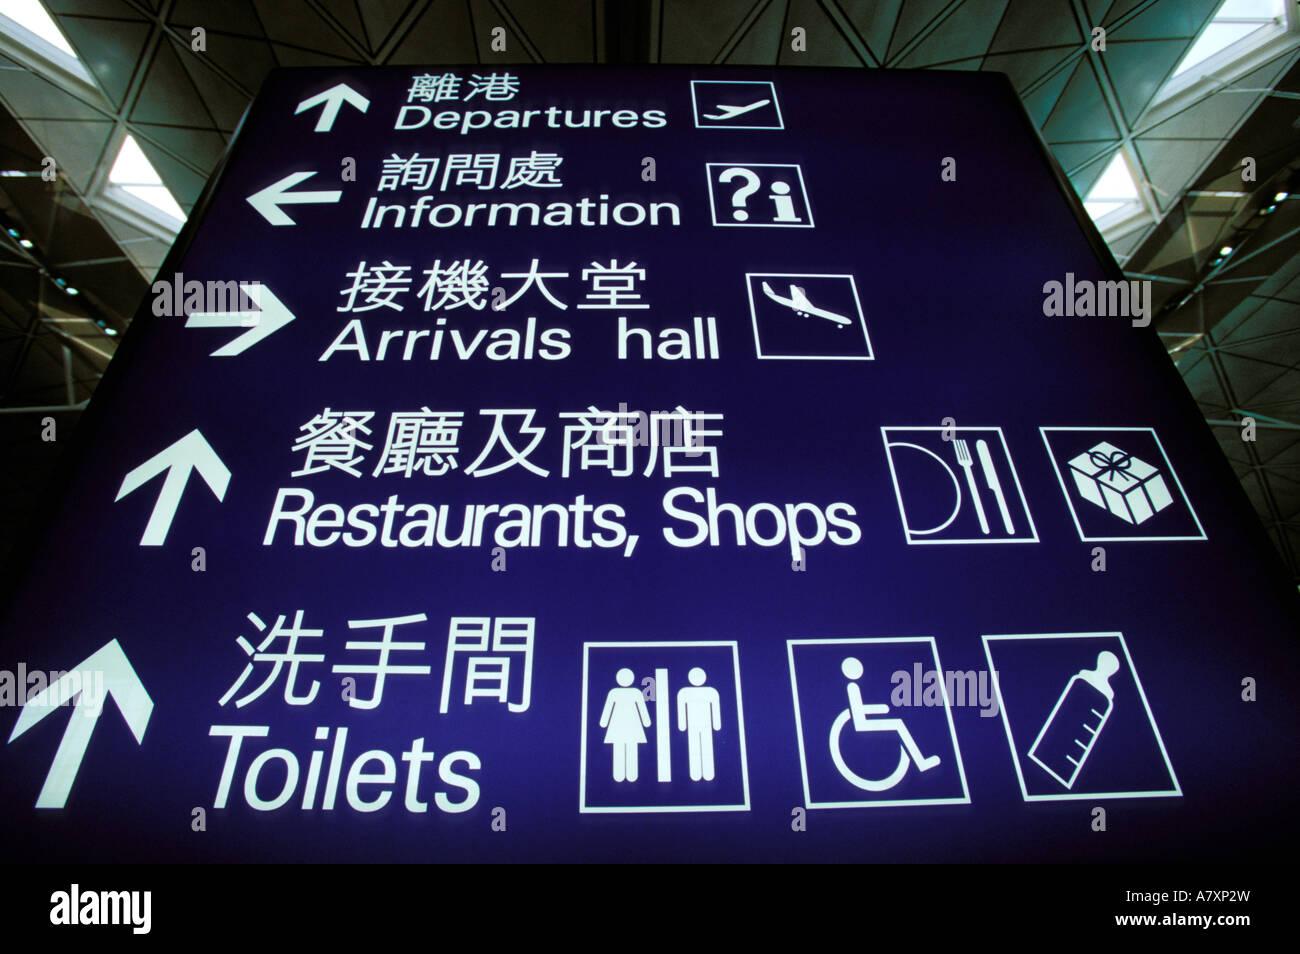 Asia, China, Hong Kong, Lantau Island. Chek Lap Kok Airport, main terminal signage - Stock Image